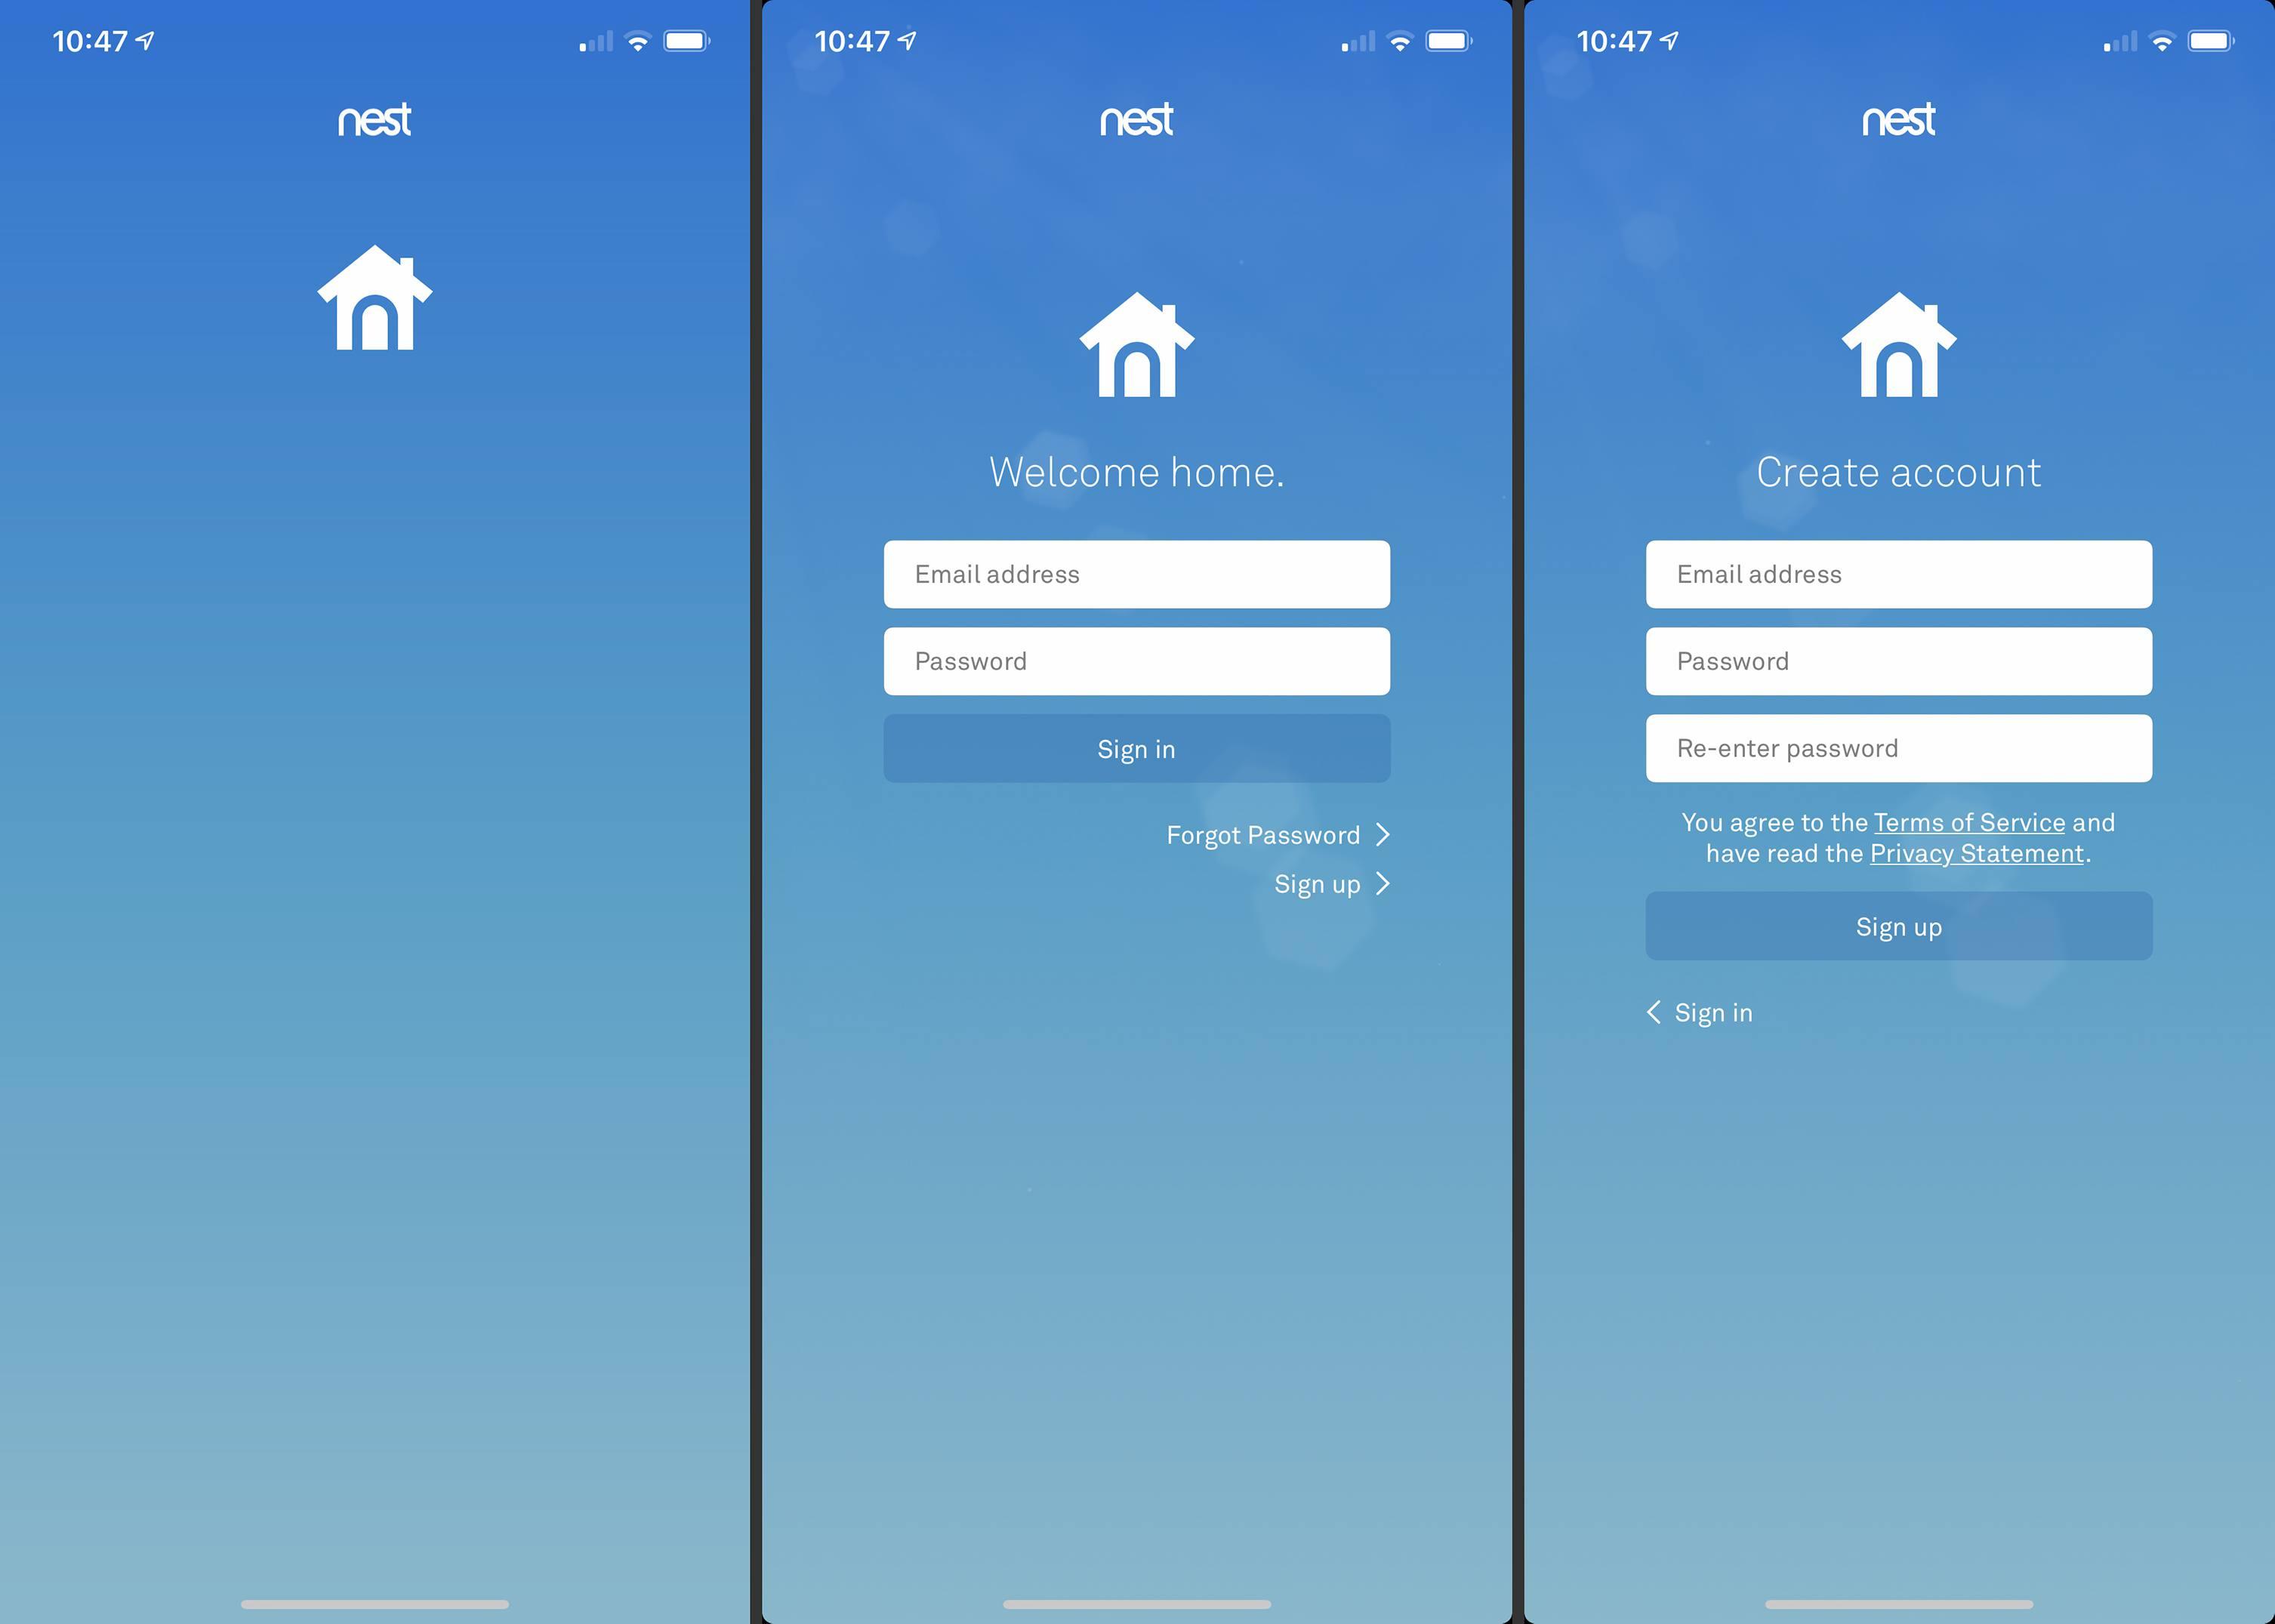 Three screens from Nest app on iOS